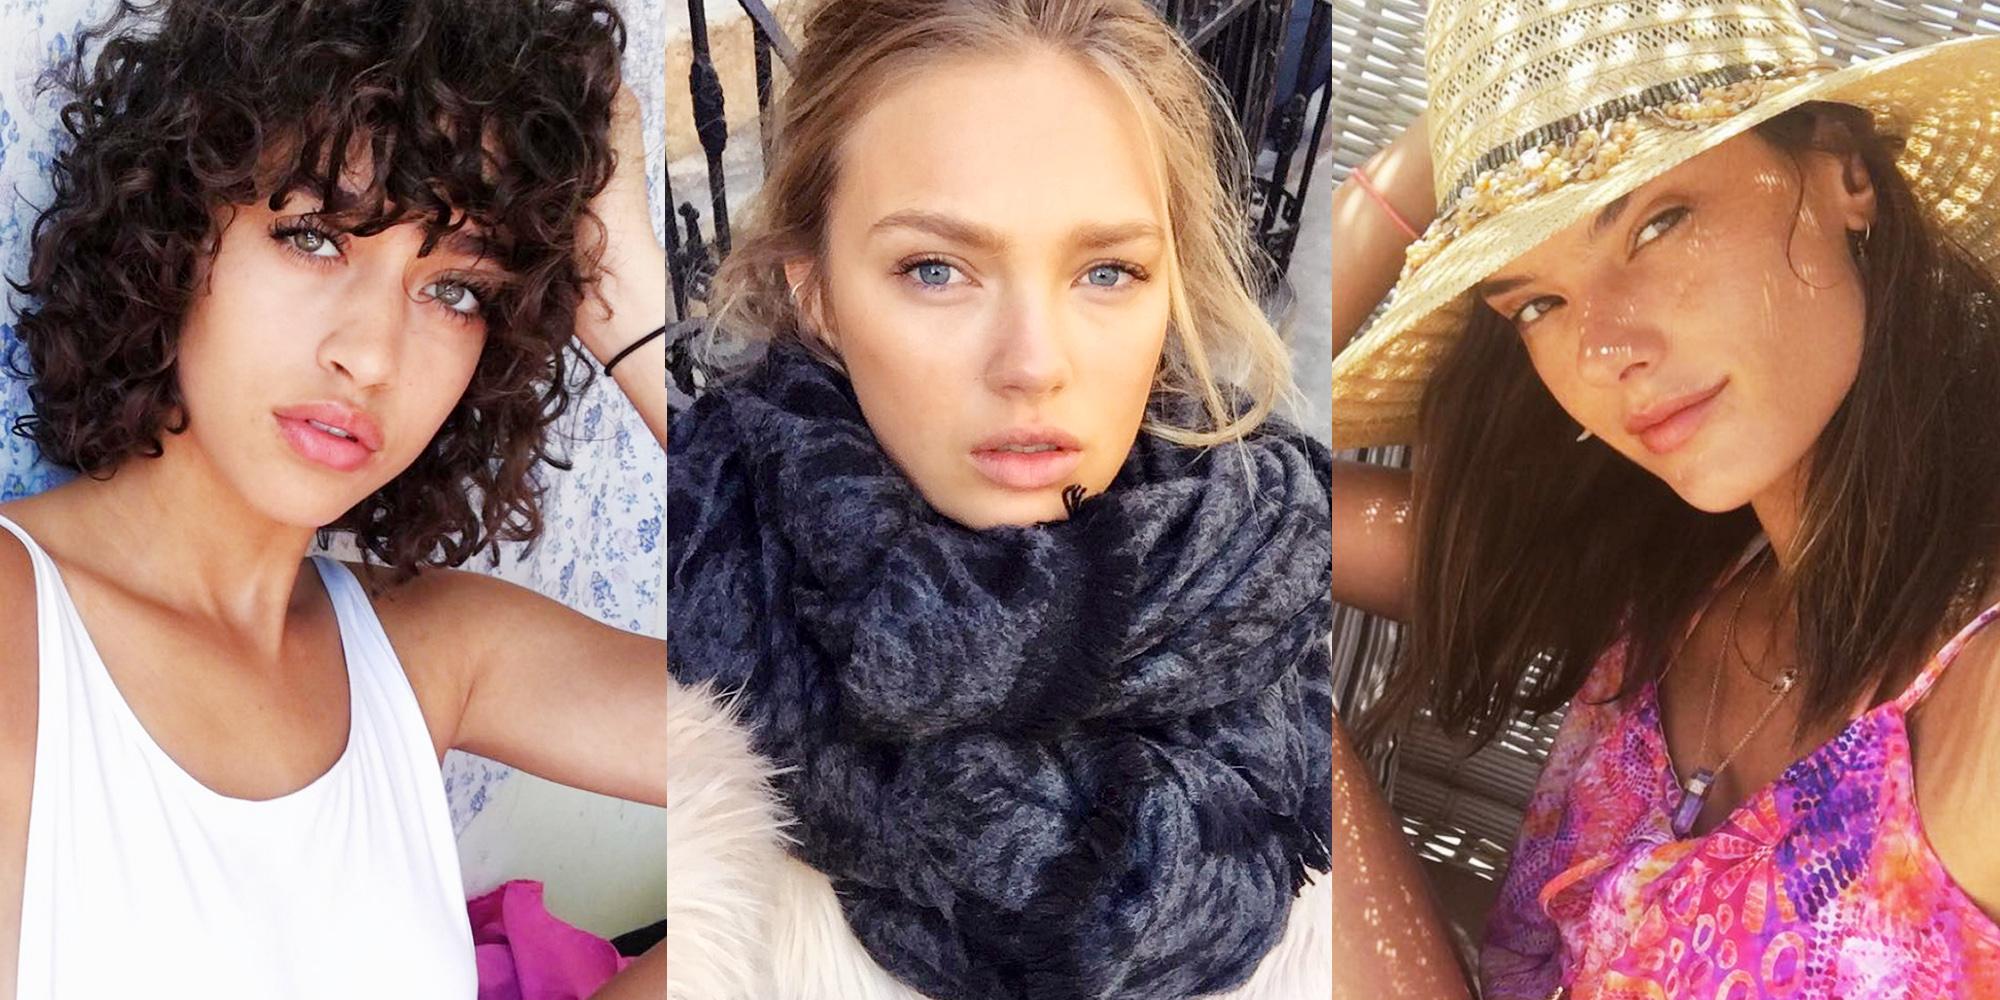 15 Victoria's Secret Models Without Makeup - VS Angels ...